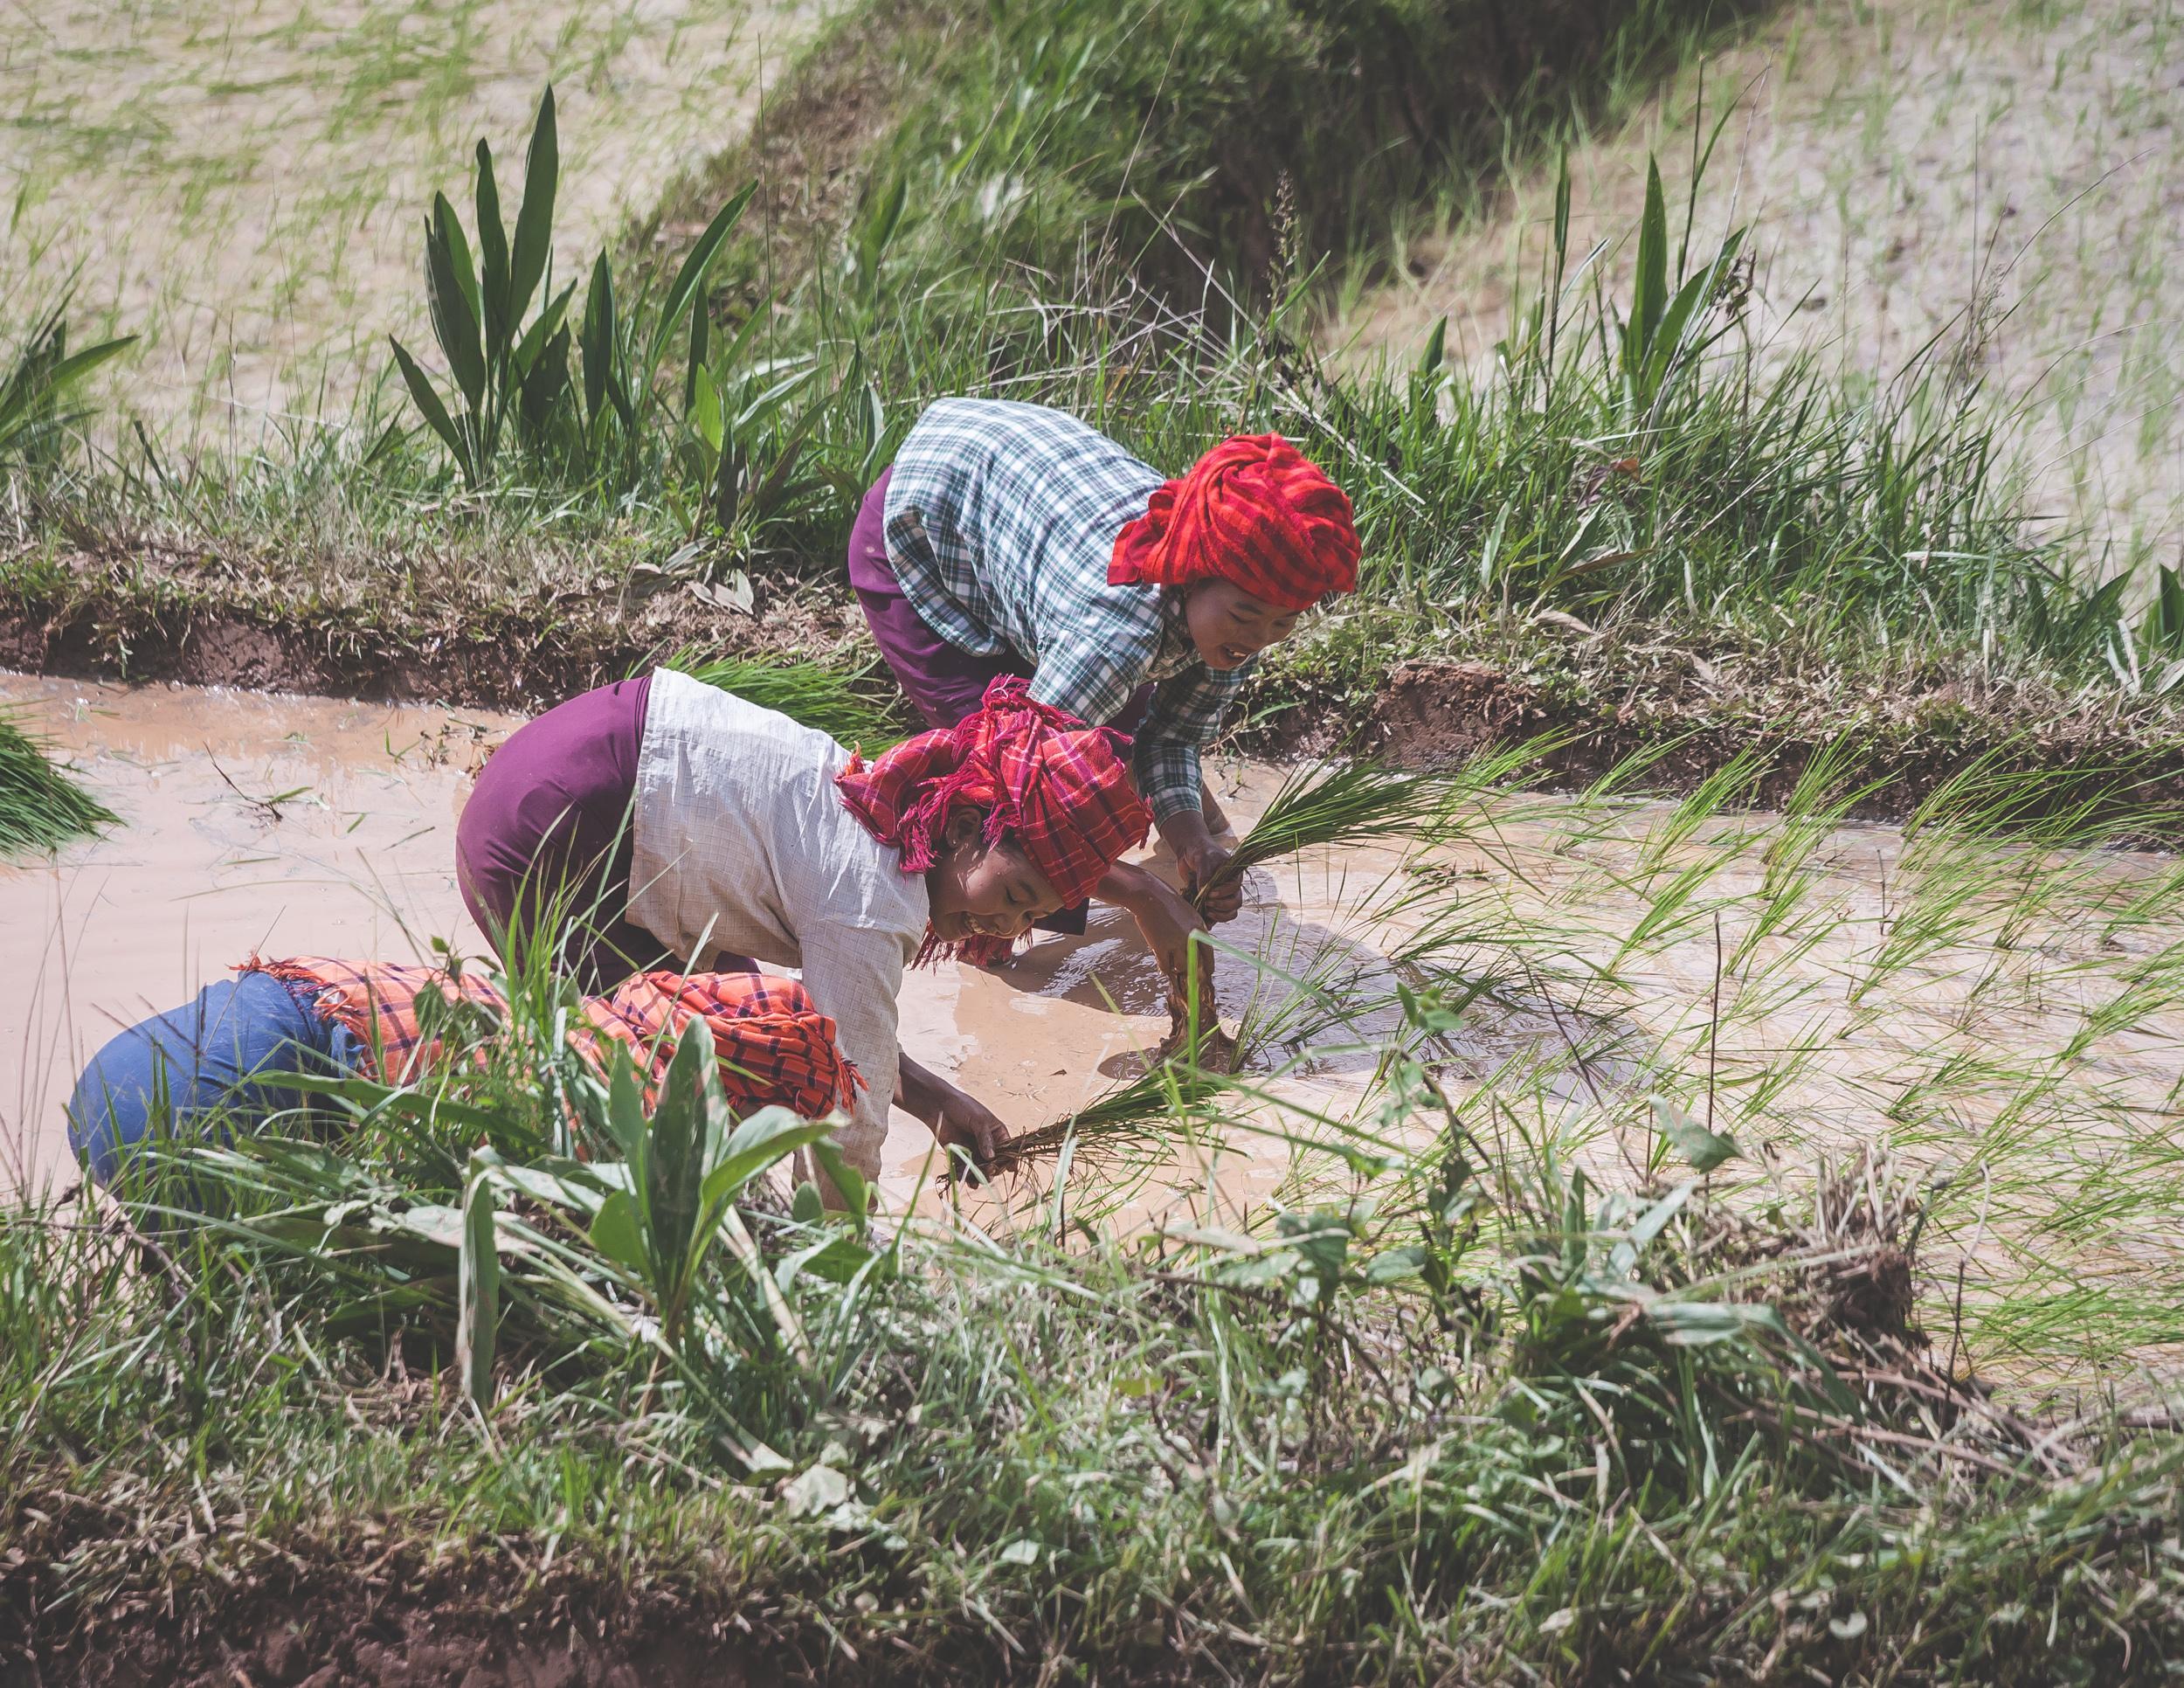 Rural Burma